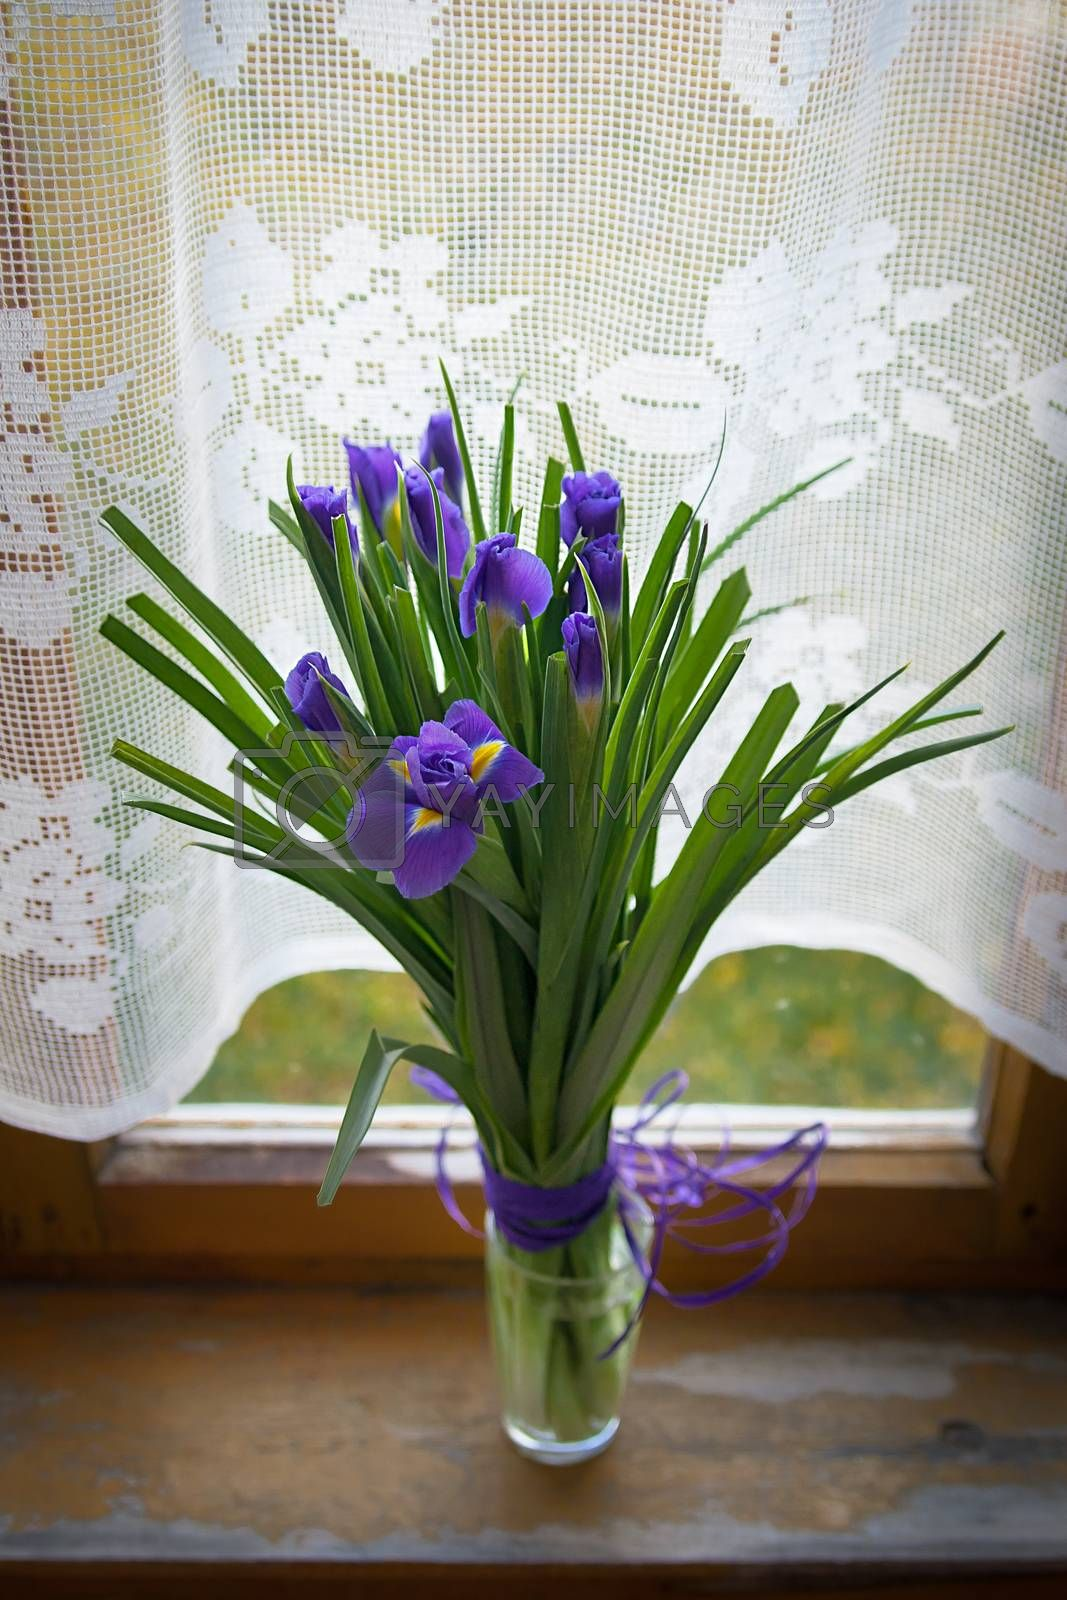 Royalty free image of Purple iris flowers in vase, on wooden table by sfinks